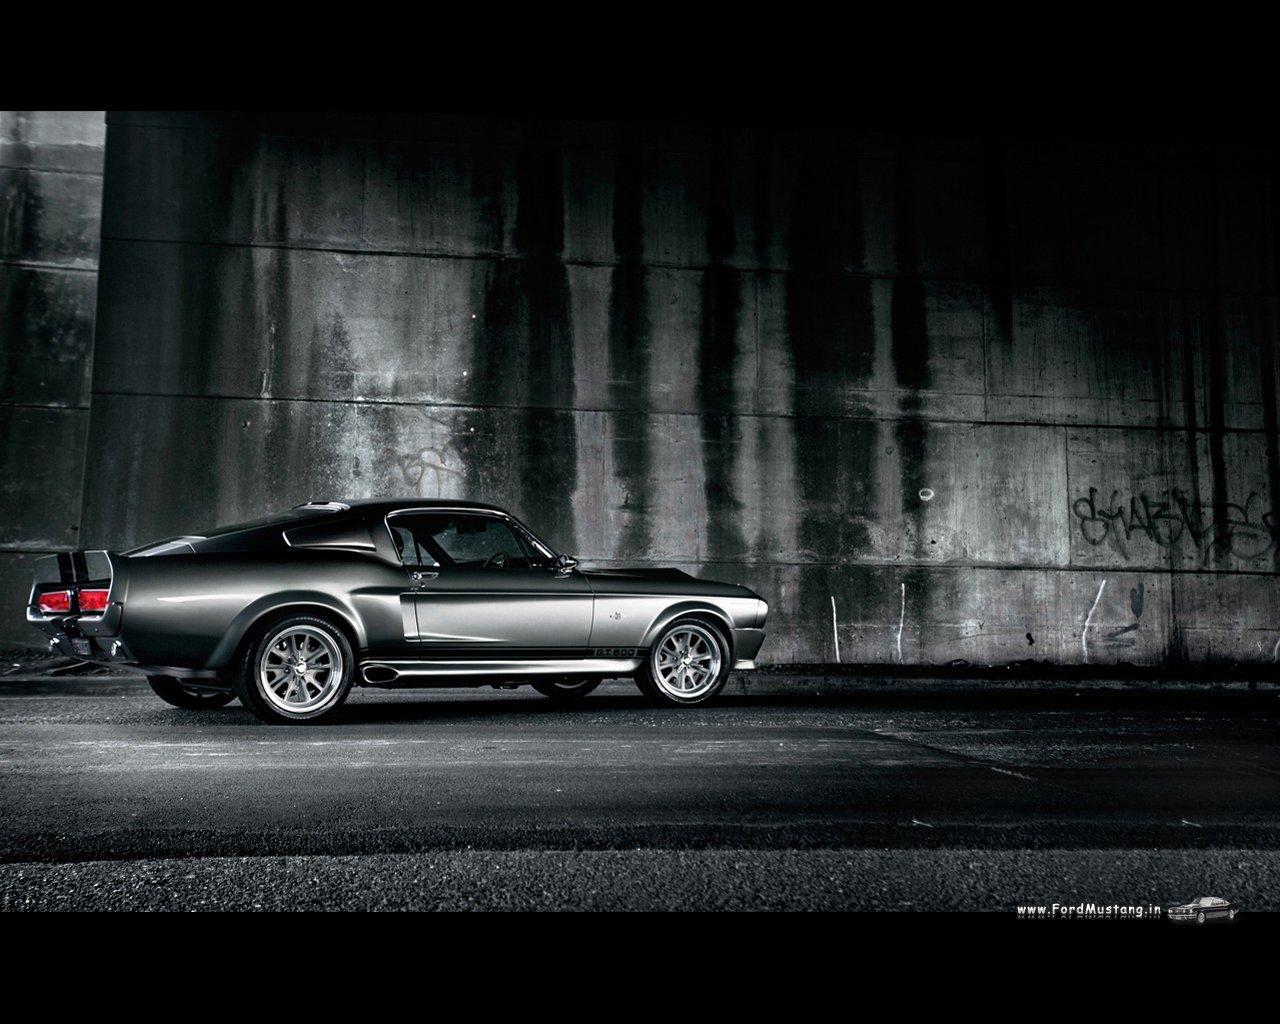 http://3.bp.blogspot.com/-n4o9T4oFWdA/TliJw6NCDBI/AAAAAAAAAHs/omKqE-f_gdY/s1600/Ford-Mustang-Shelby-GT500-1280x1024-01.jpg